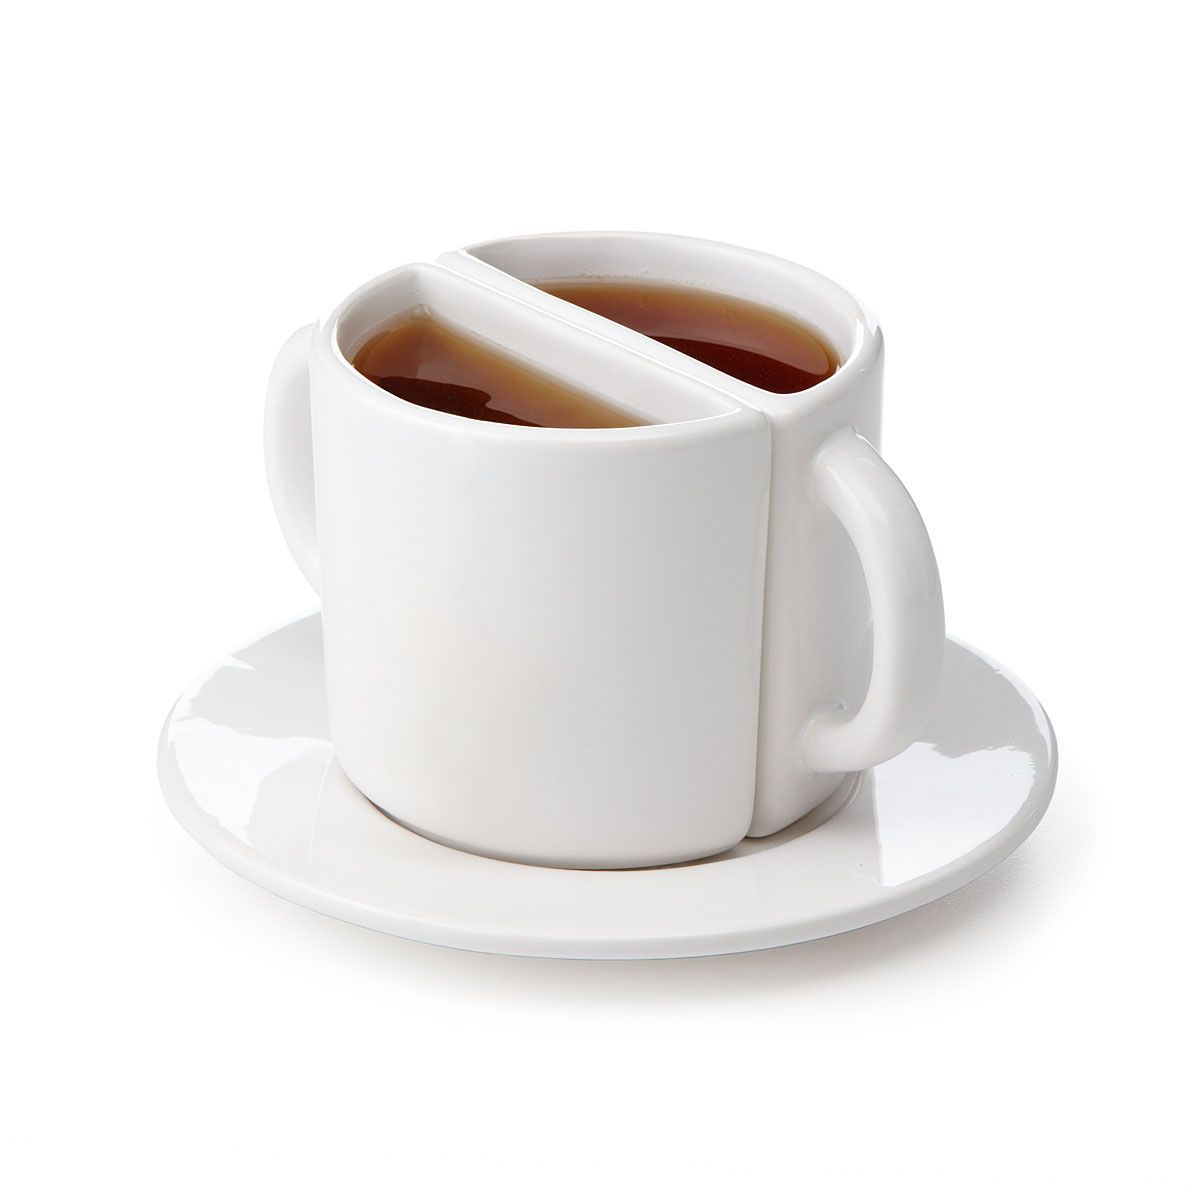 porcelain tea for two set tea cups tea sets teacup sets